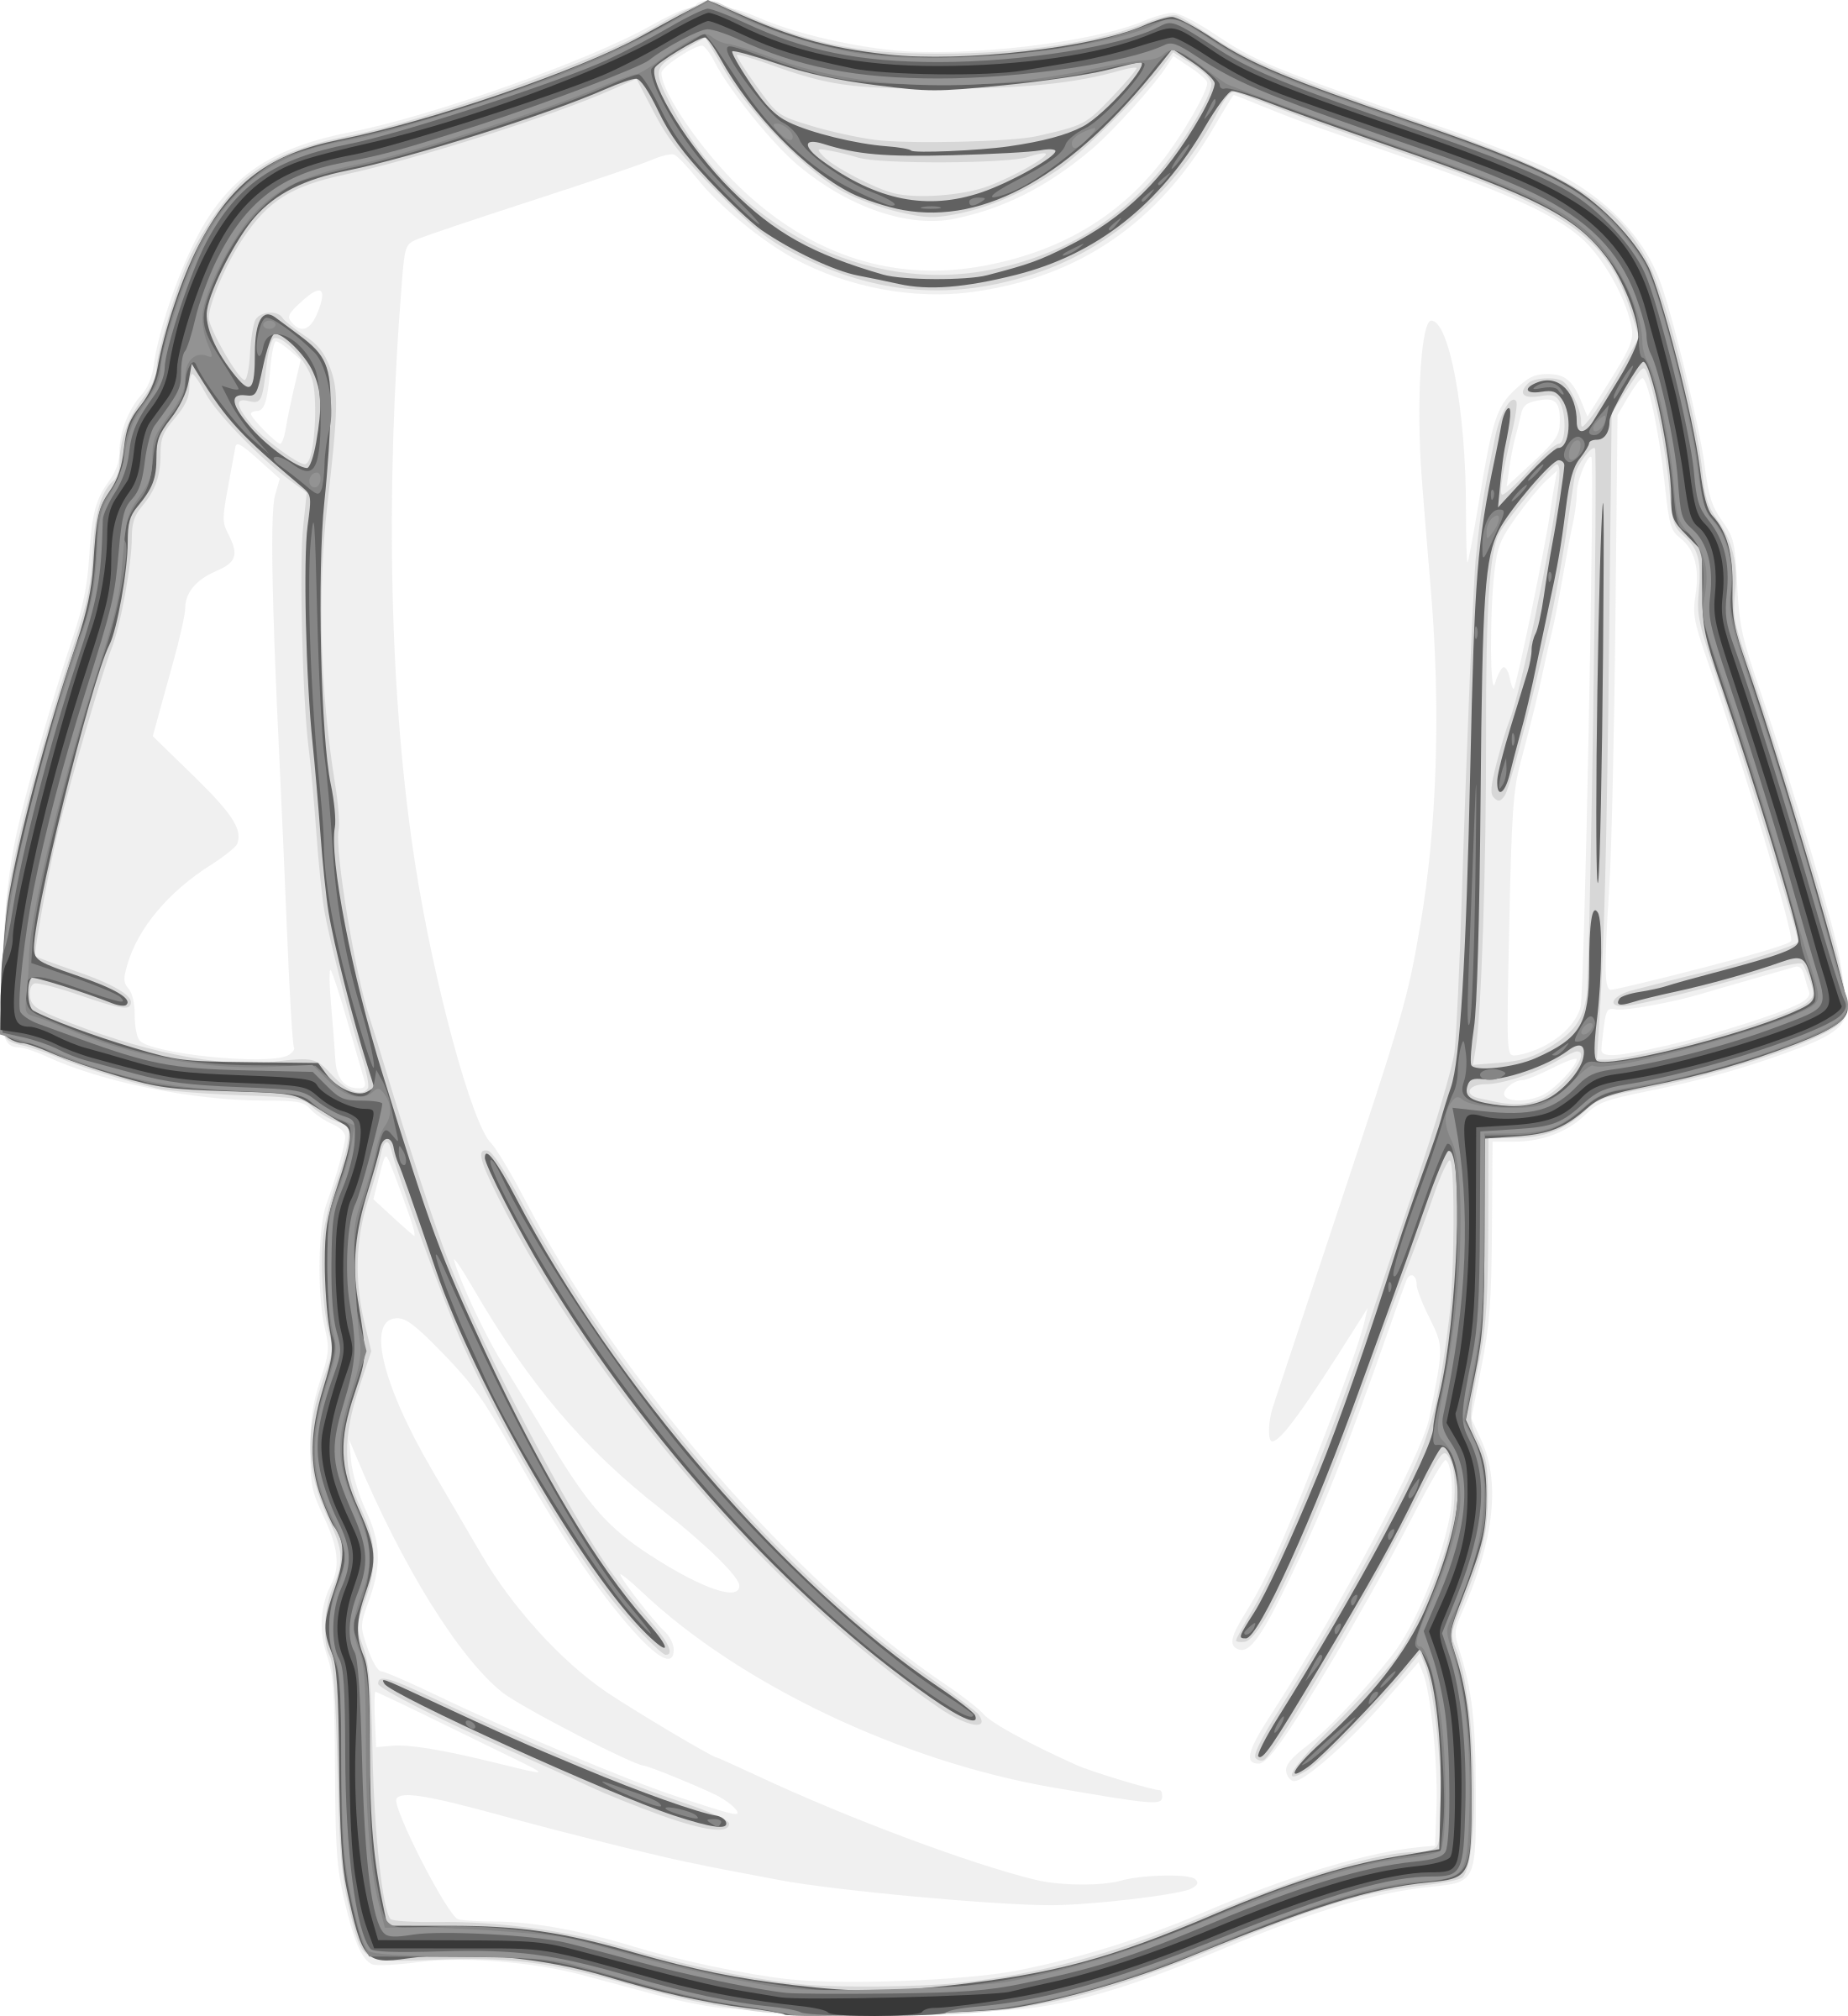 Clipart basketball shirt. Blank t big image